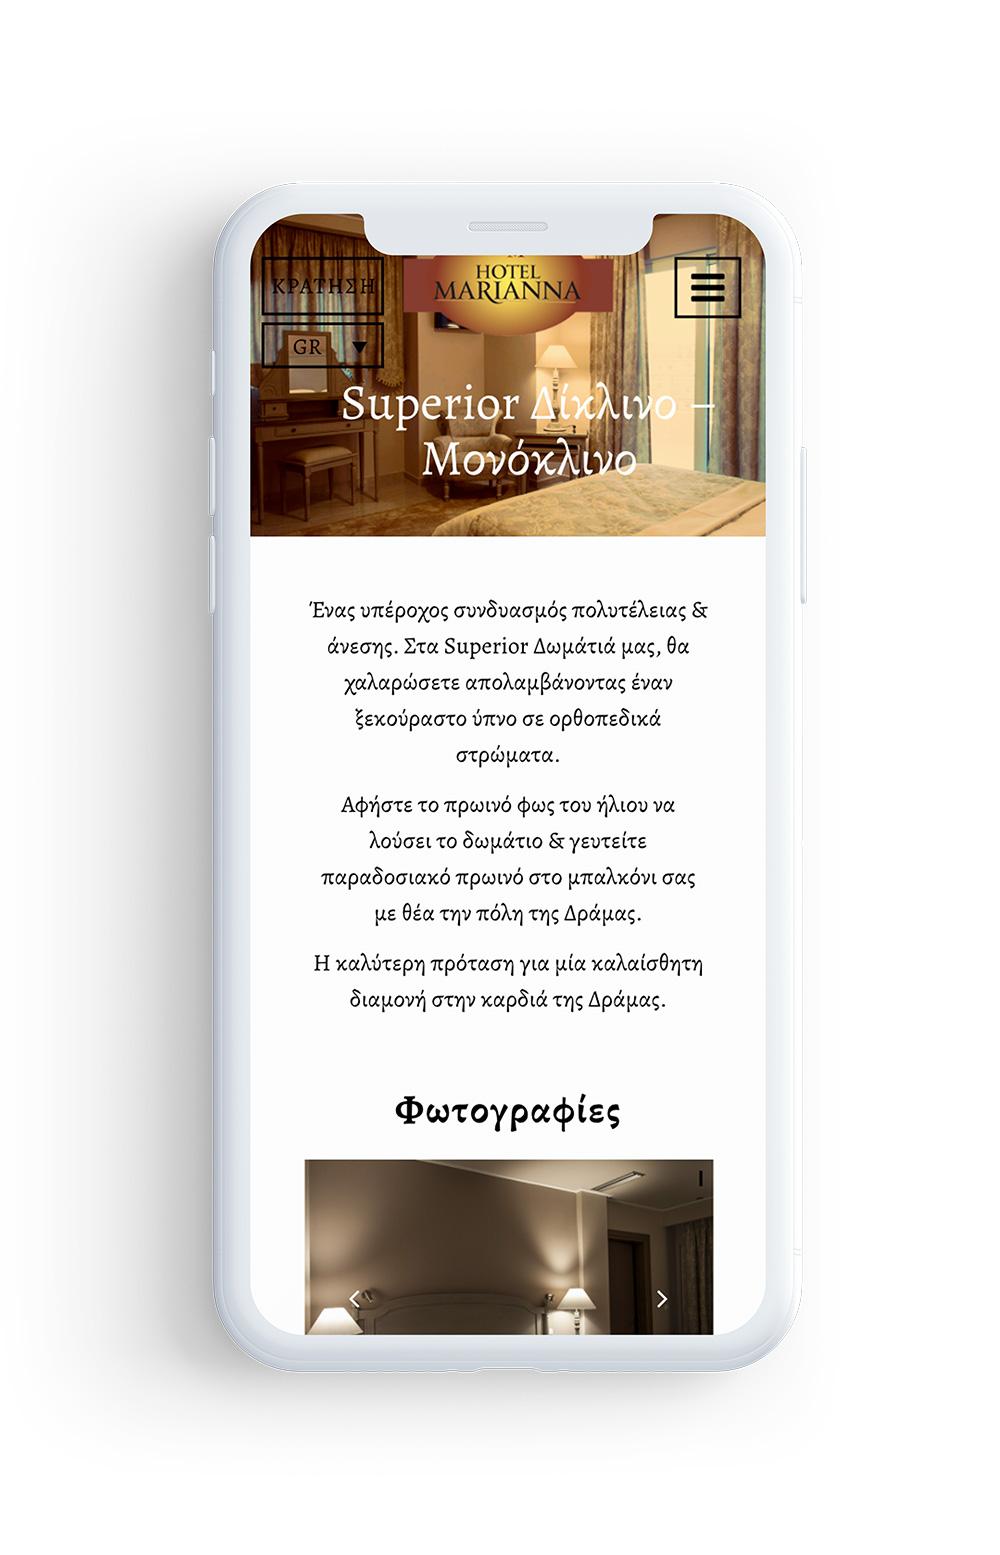 marianna-hotel-mobile-1